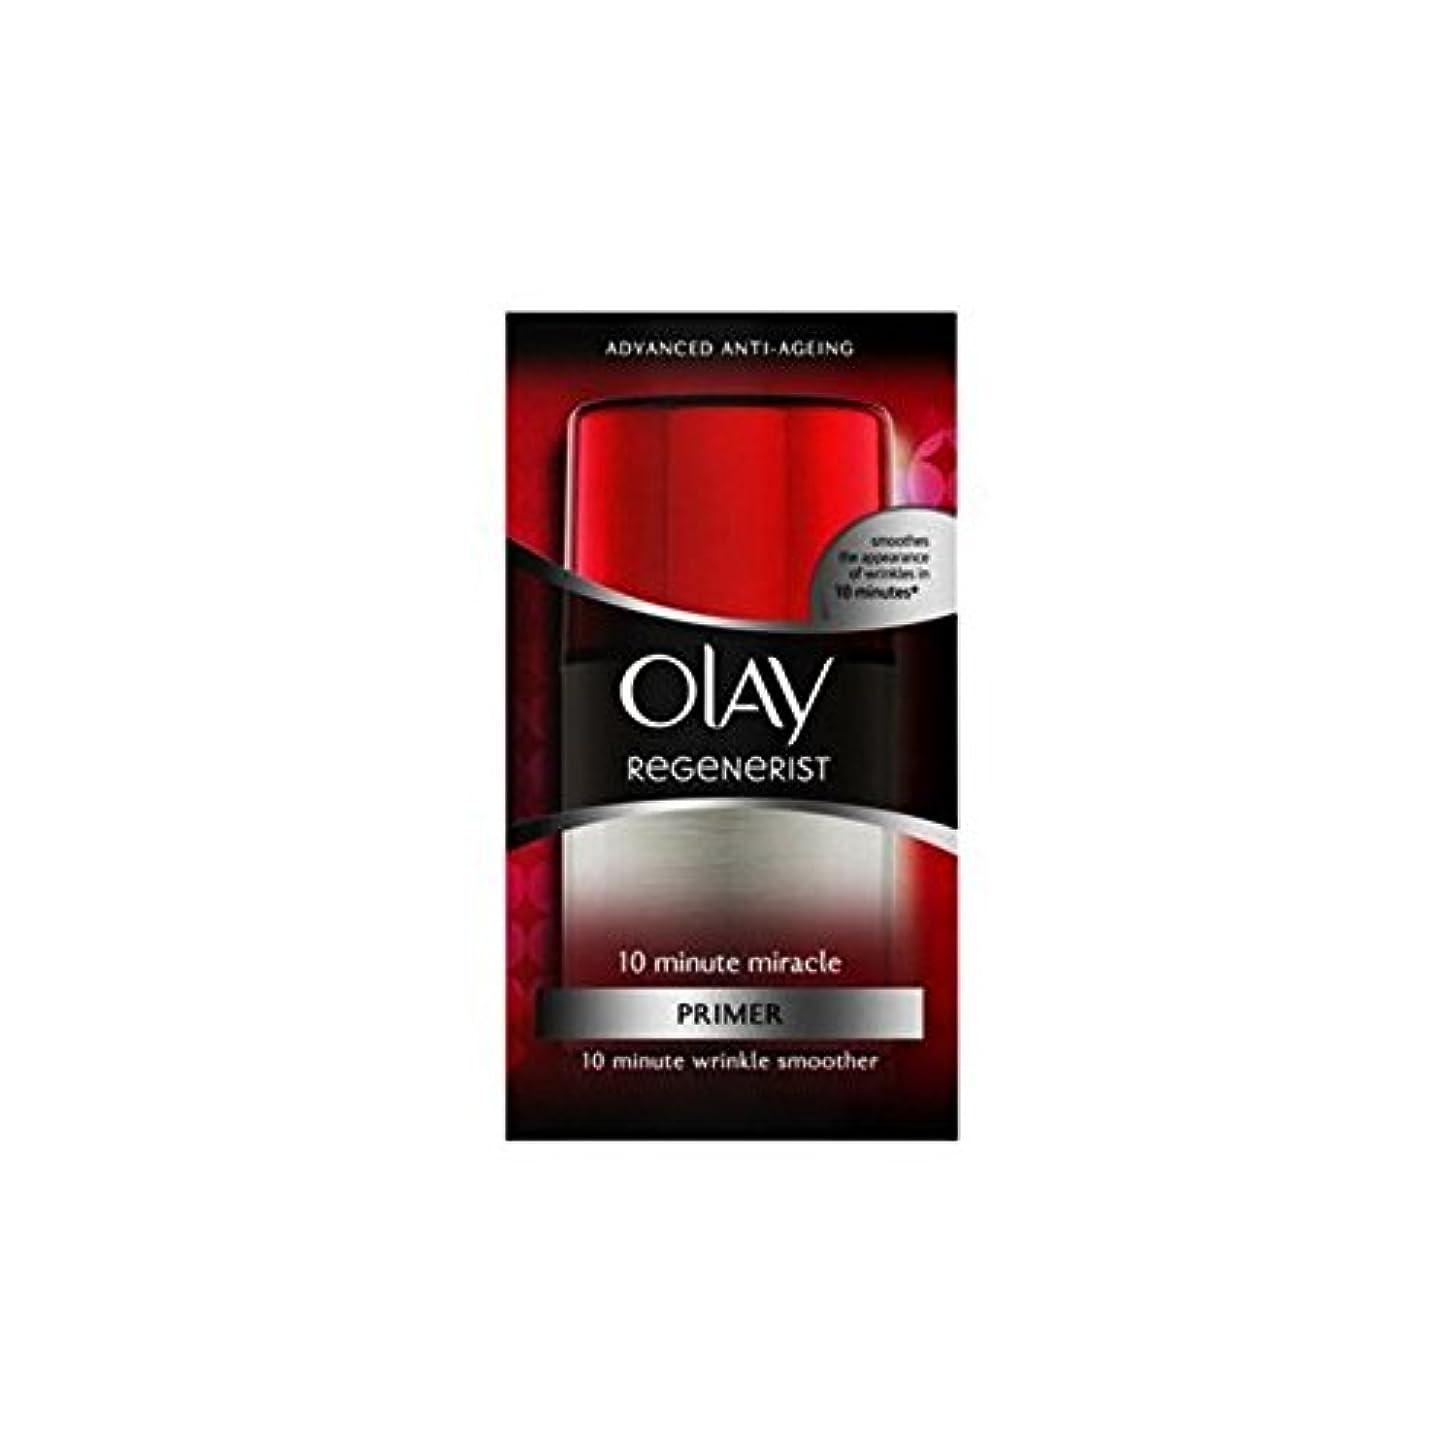 Olay Regenerist Super 10 Minute Miracle Facial Moisturiser (50ml) (Pack of 6) - オーレイリジェネスーパー10分の奇跡顔の保湿剤(50ミリリットル...